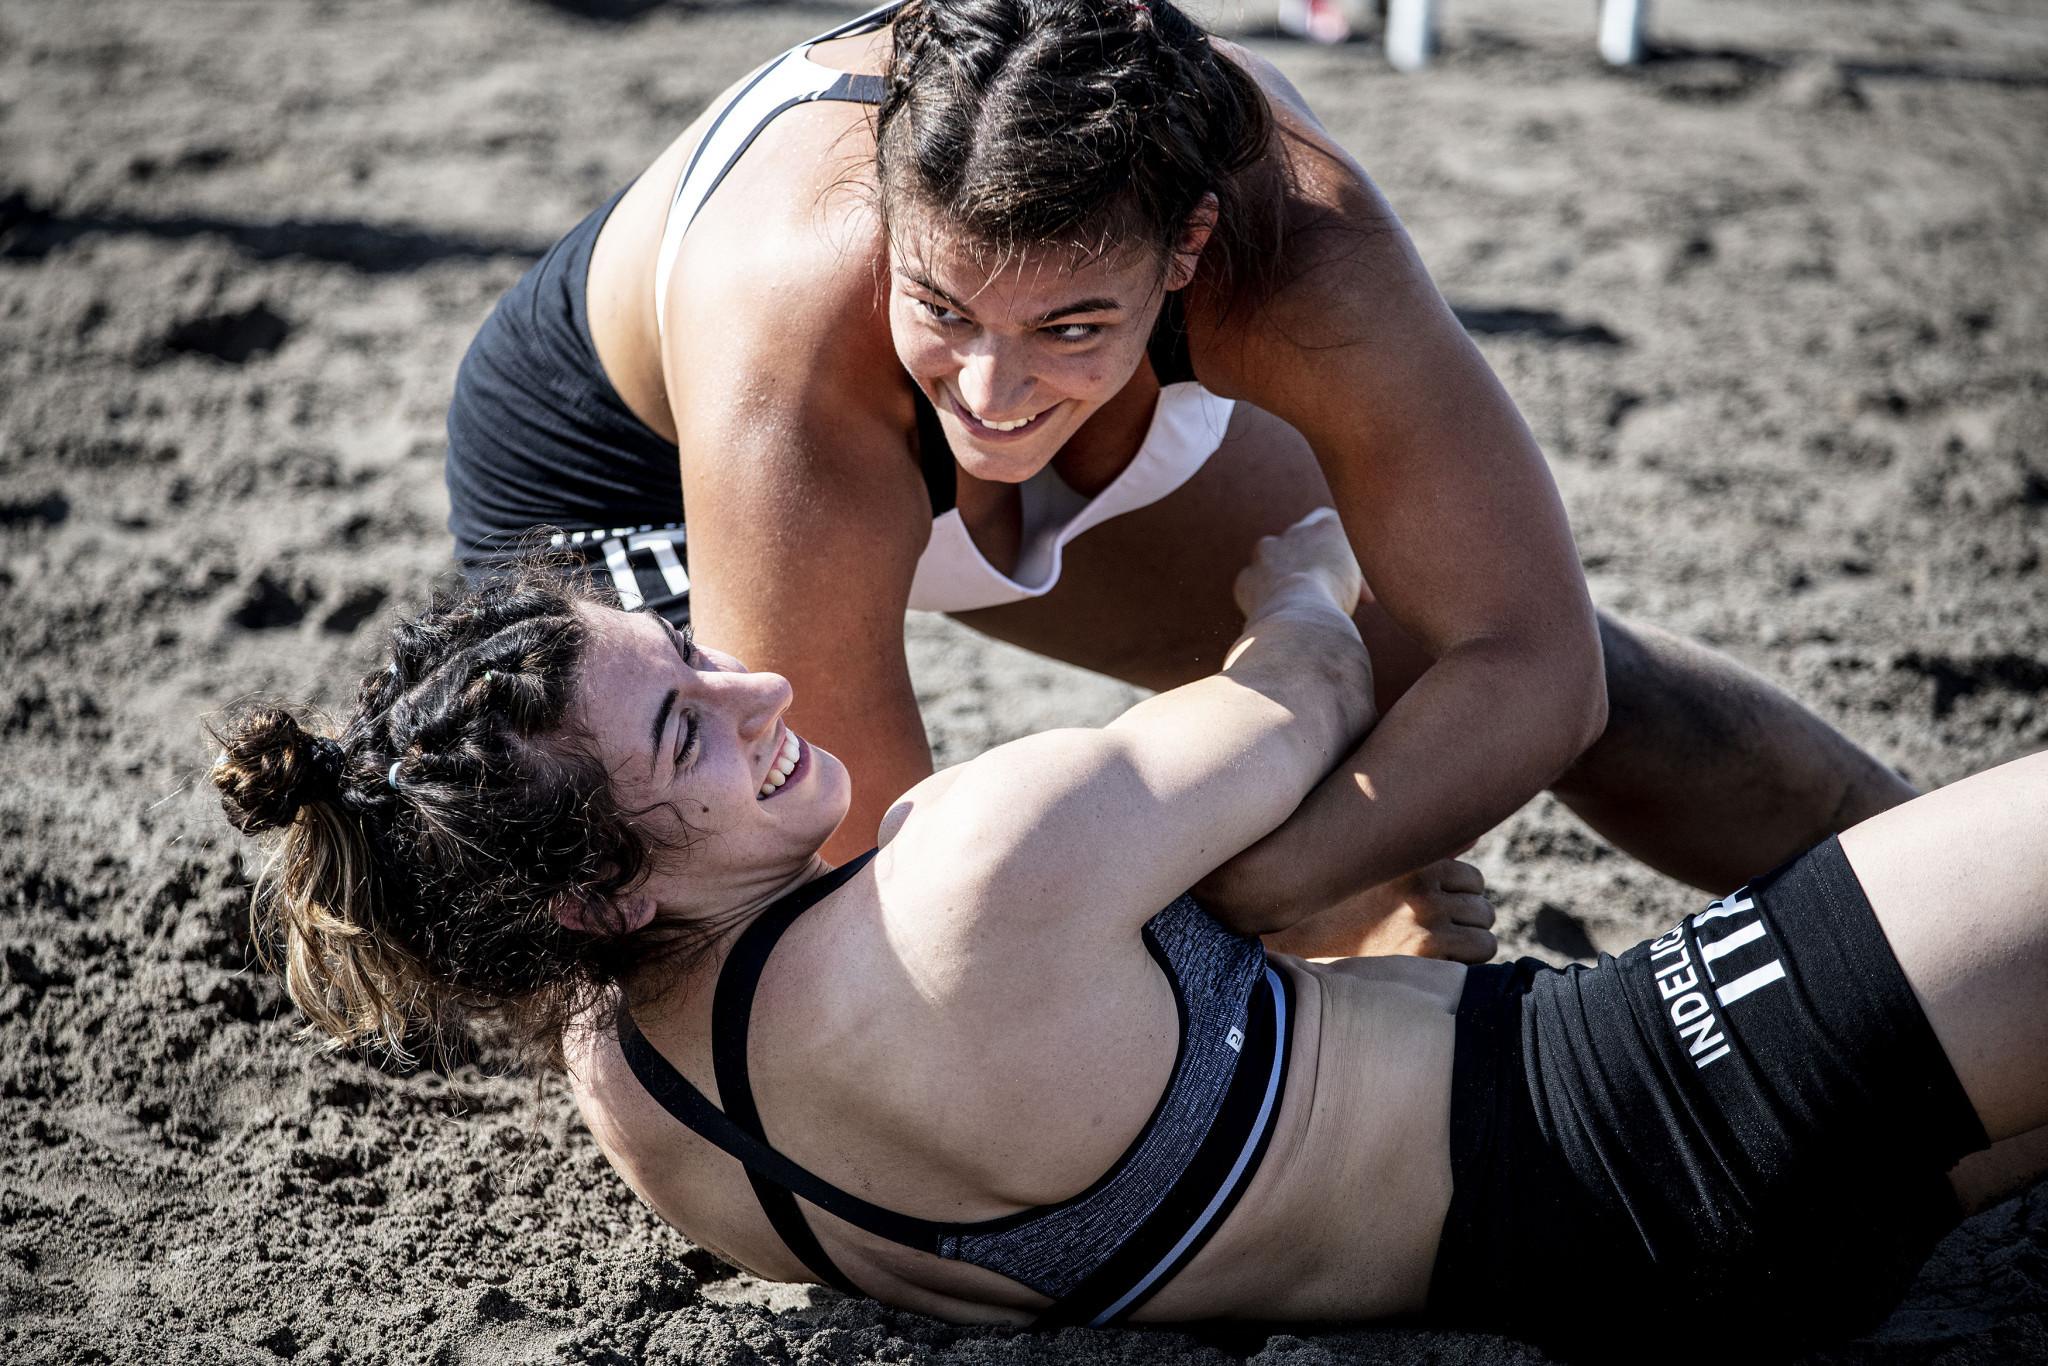 Rinaldi rules in Rome at Beach Wrestling World Series